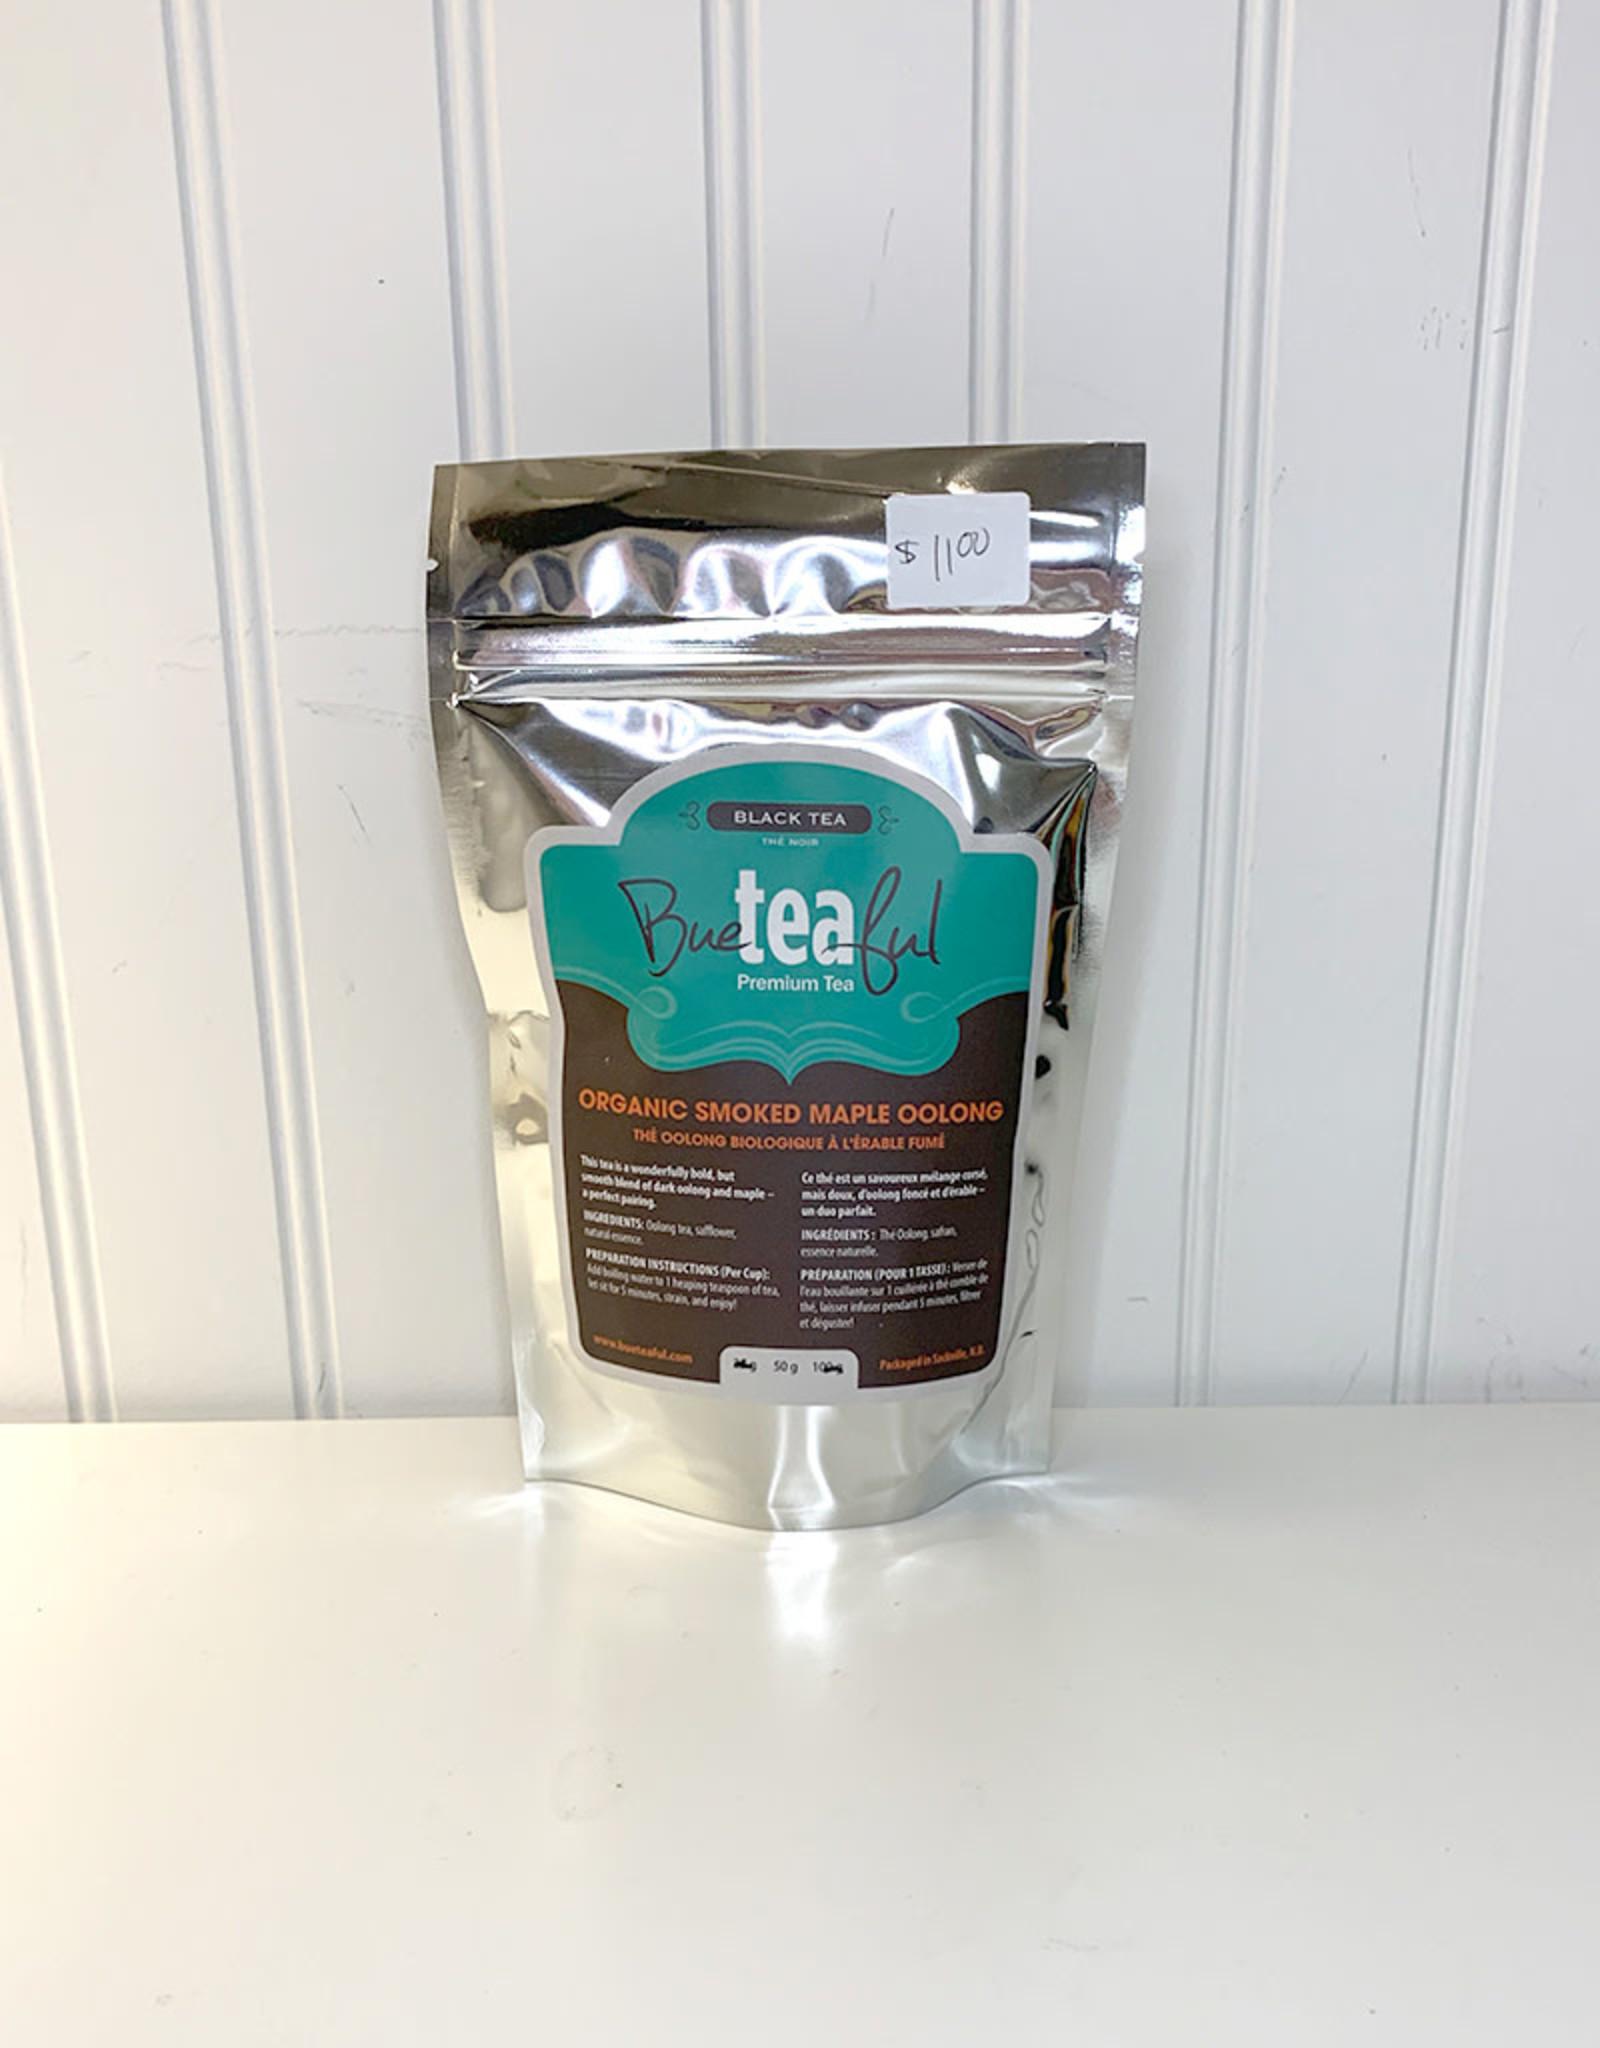 Bueteaful Tea Bueteaful - Tea, Smoked Maple Oolong